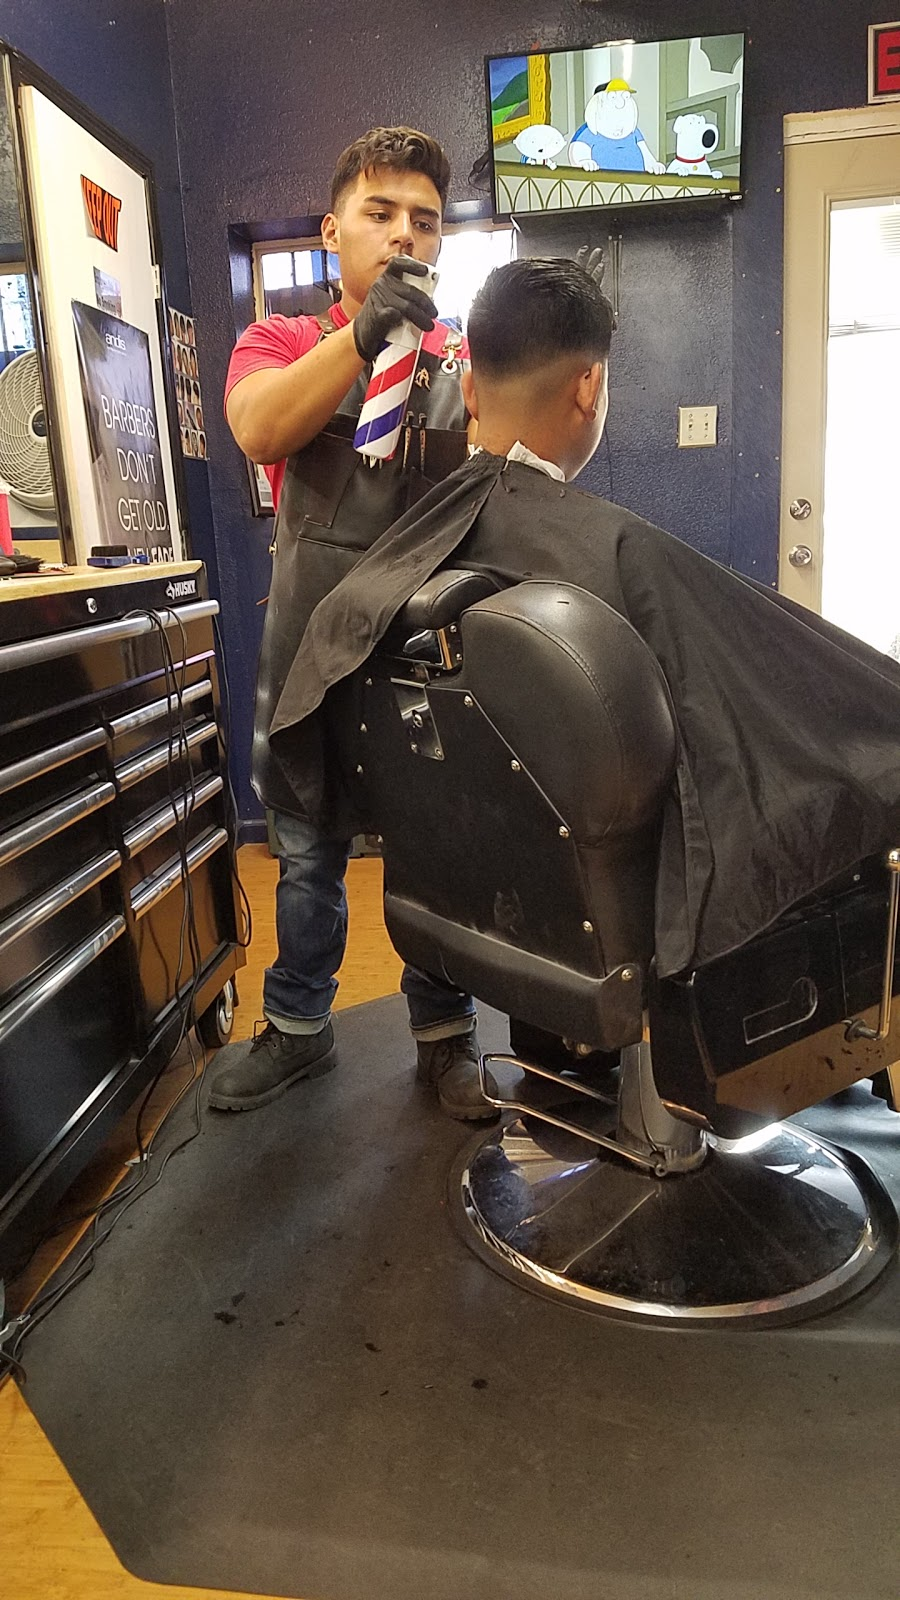 Modelos Barber Shop | hair care | 364 Richgrove Dr, Richgrove, CA 93261, USA | 6616996501 OR +1 661-699-6501